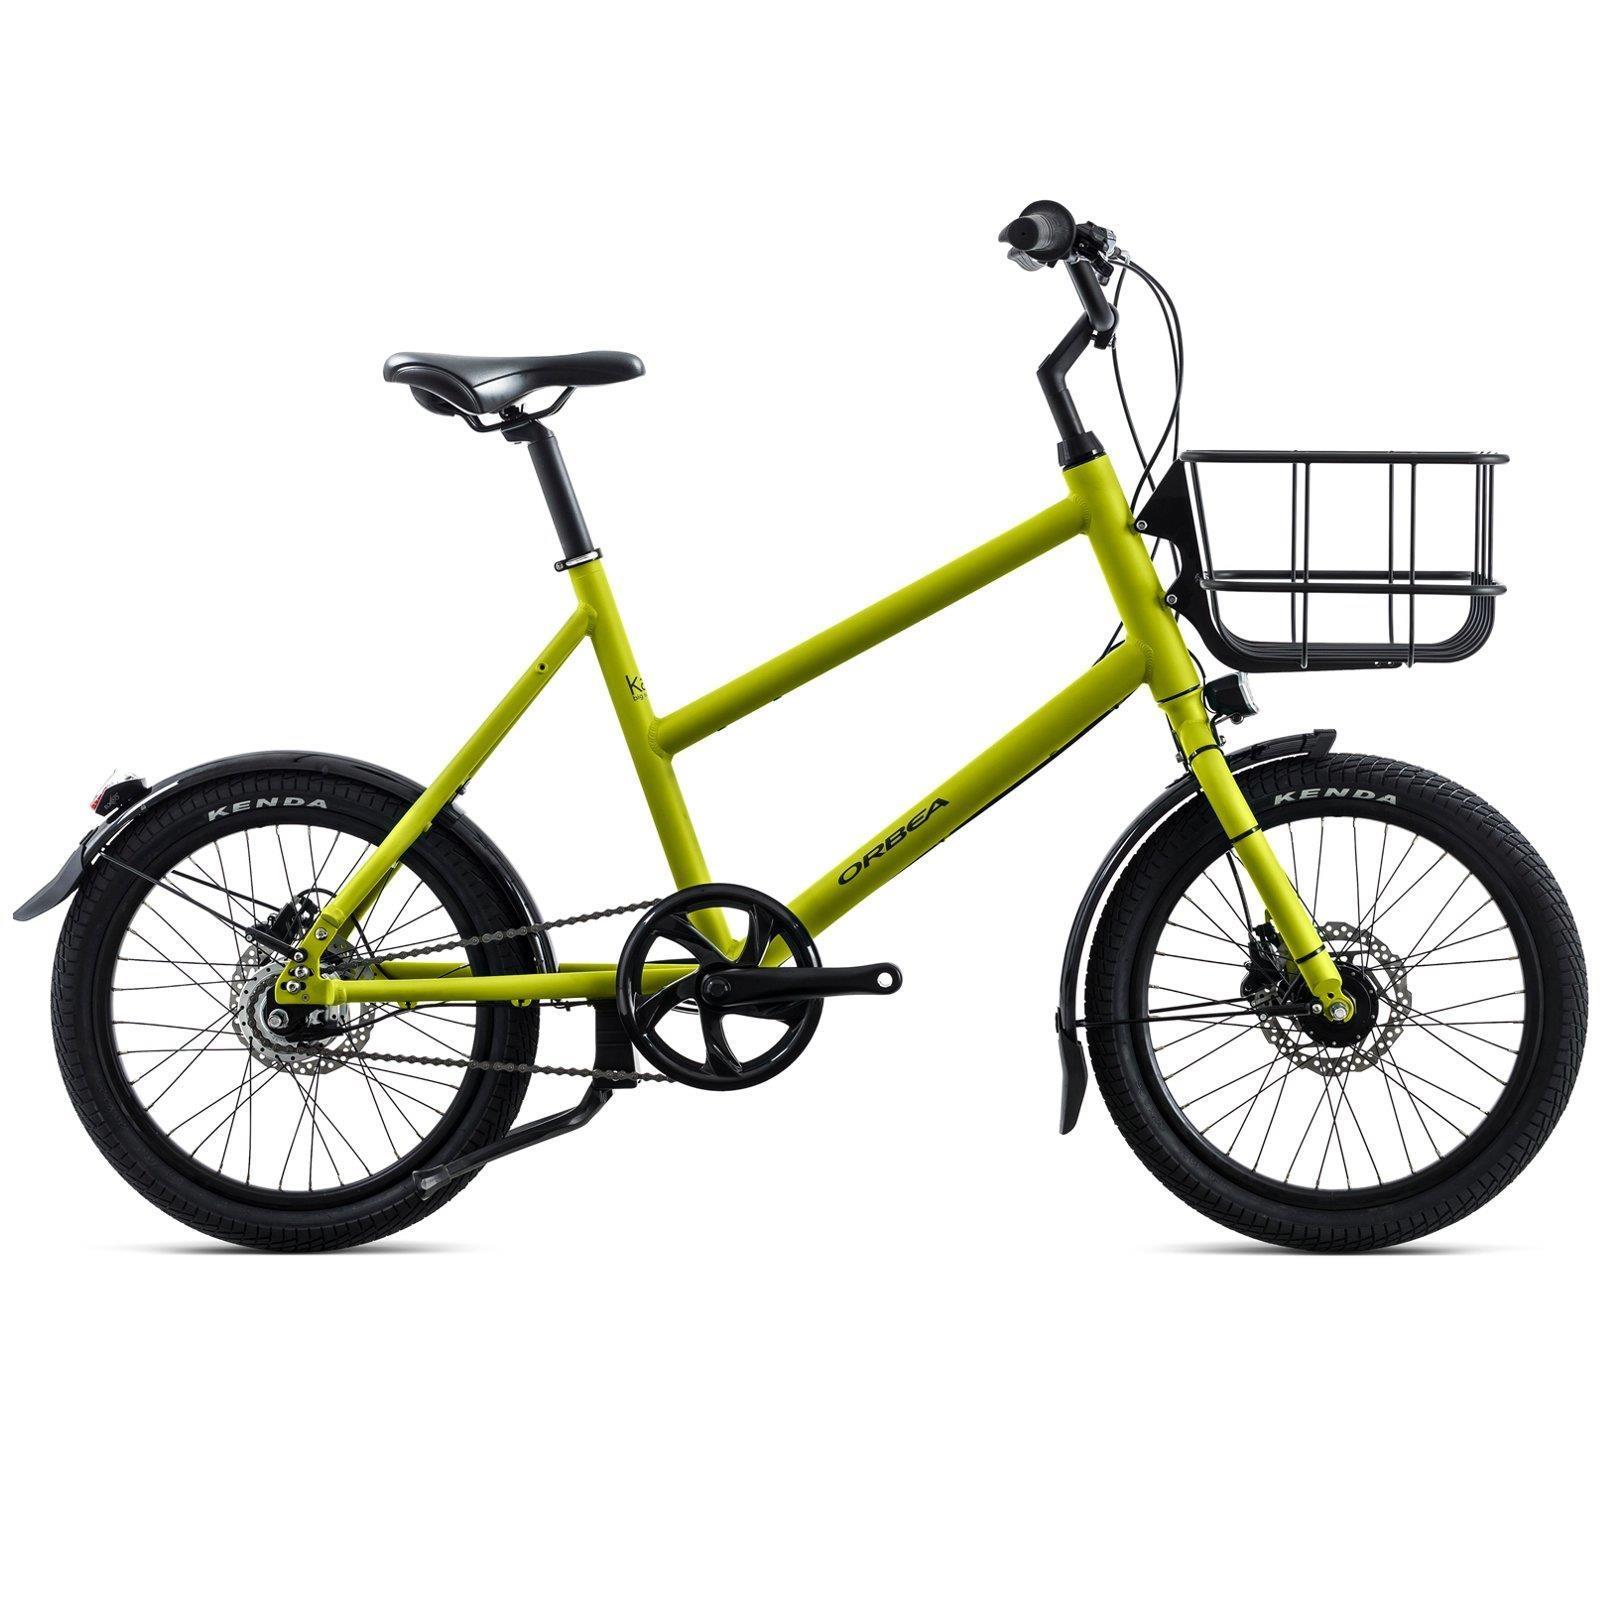 orbea katu 30 20 zoll city bike fahrrad 1 gang aluminium. Black Bedroom Furniture Sets. Home Design Ideas